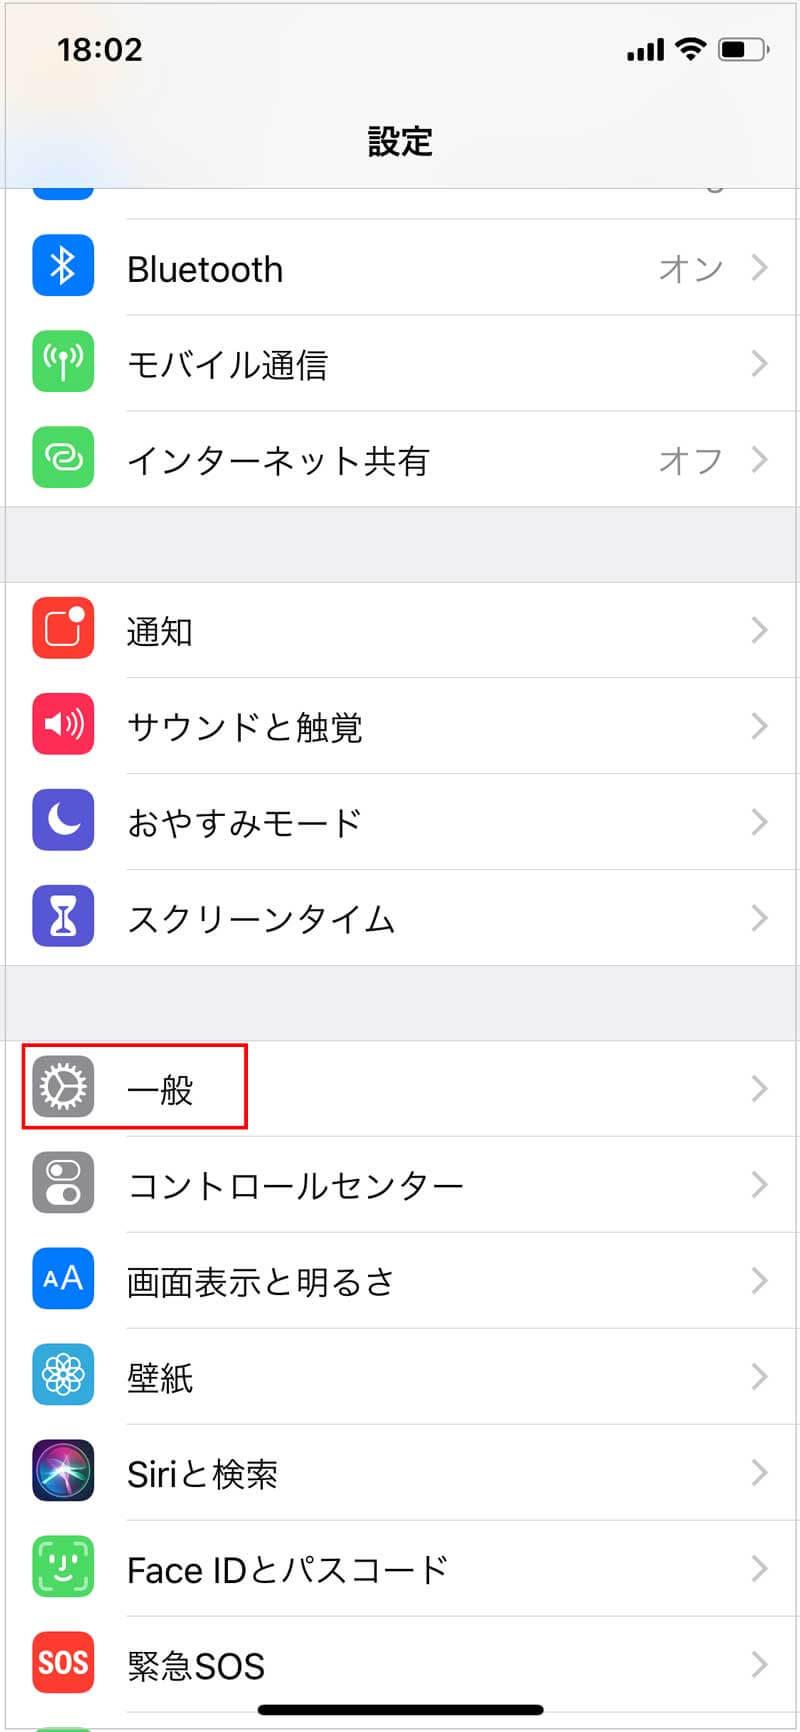 iPhoneの自動設定をオンにして海外旅行先で自動で時間を変更する